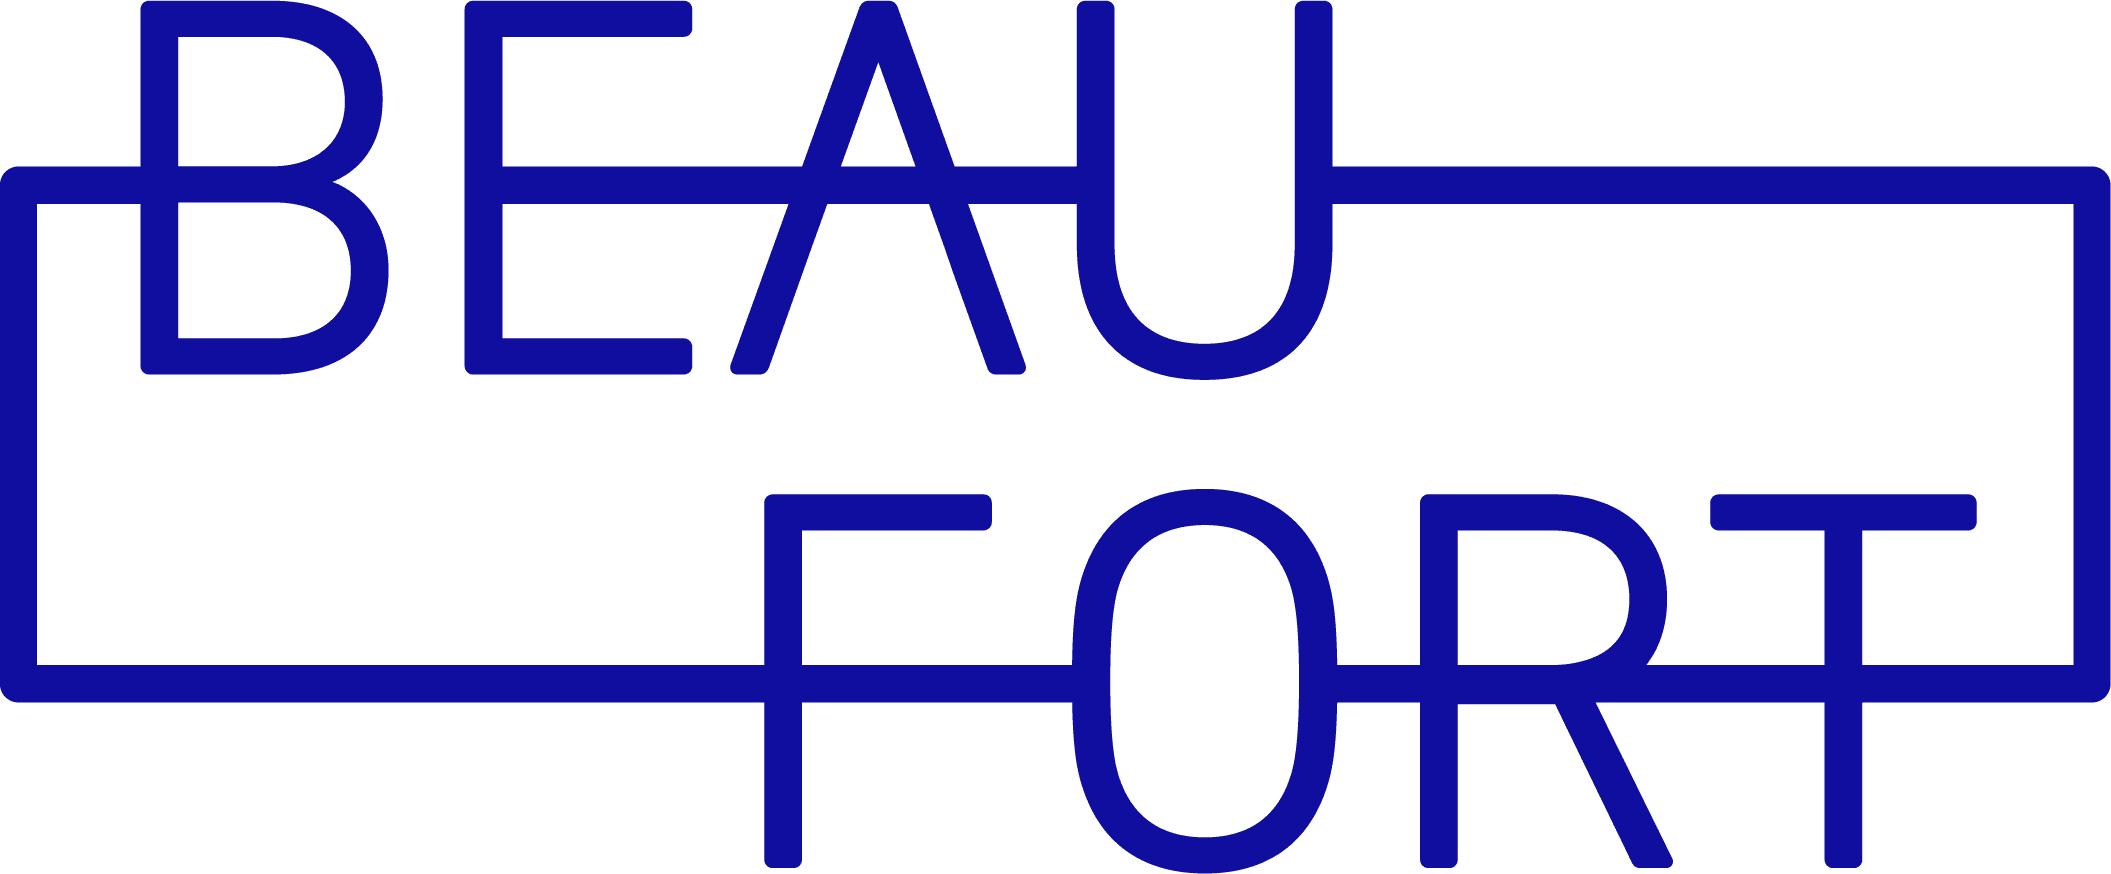 logo Beau Fort